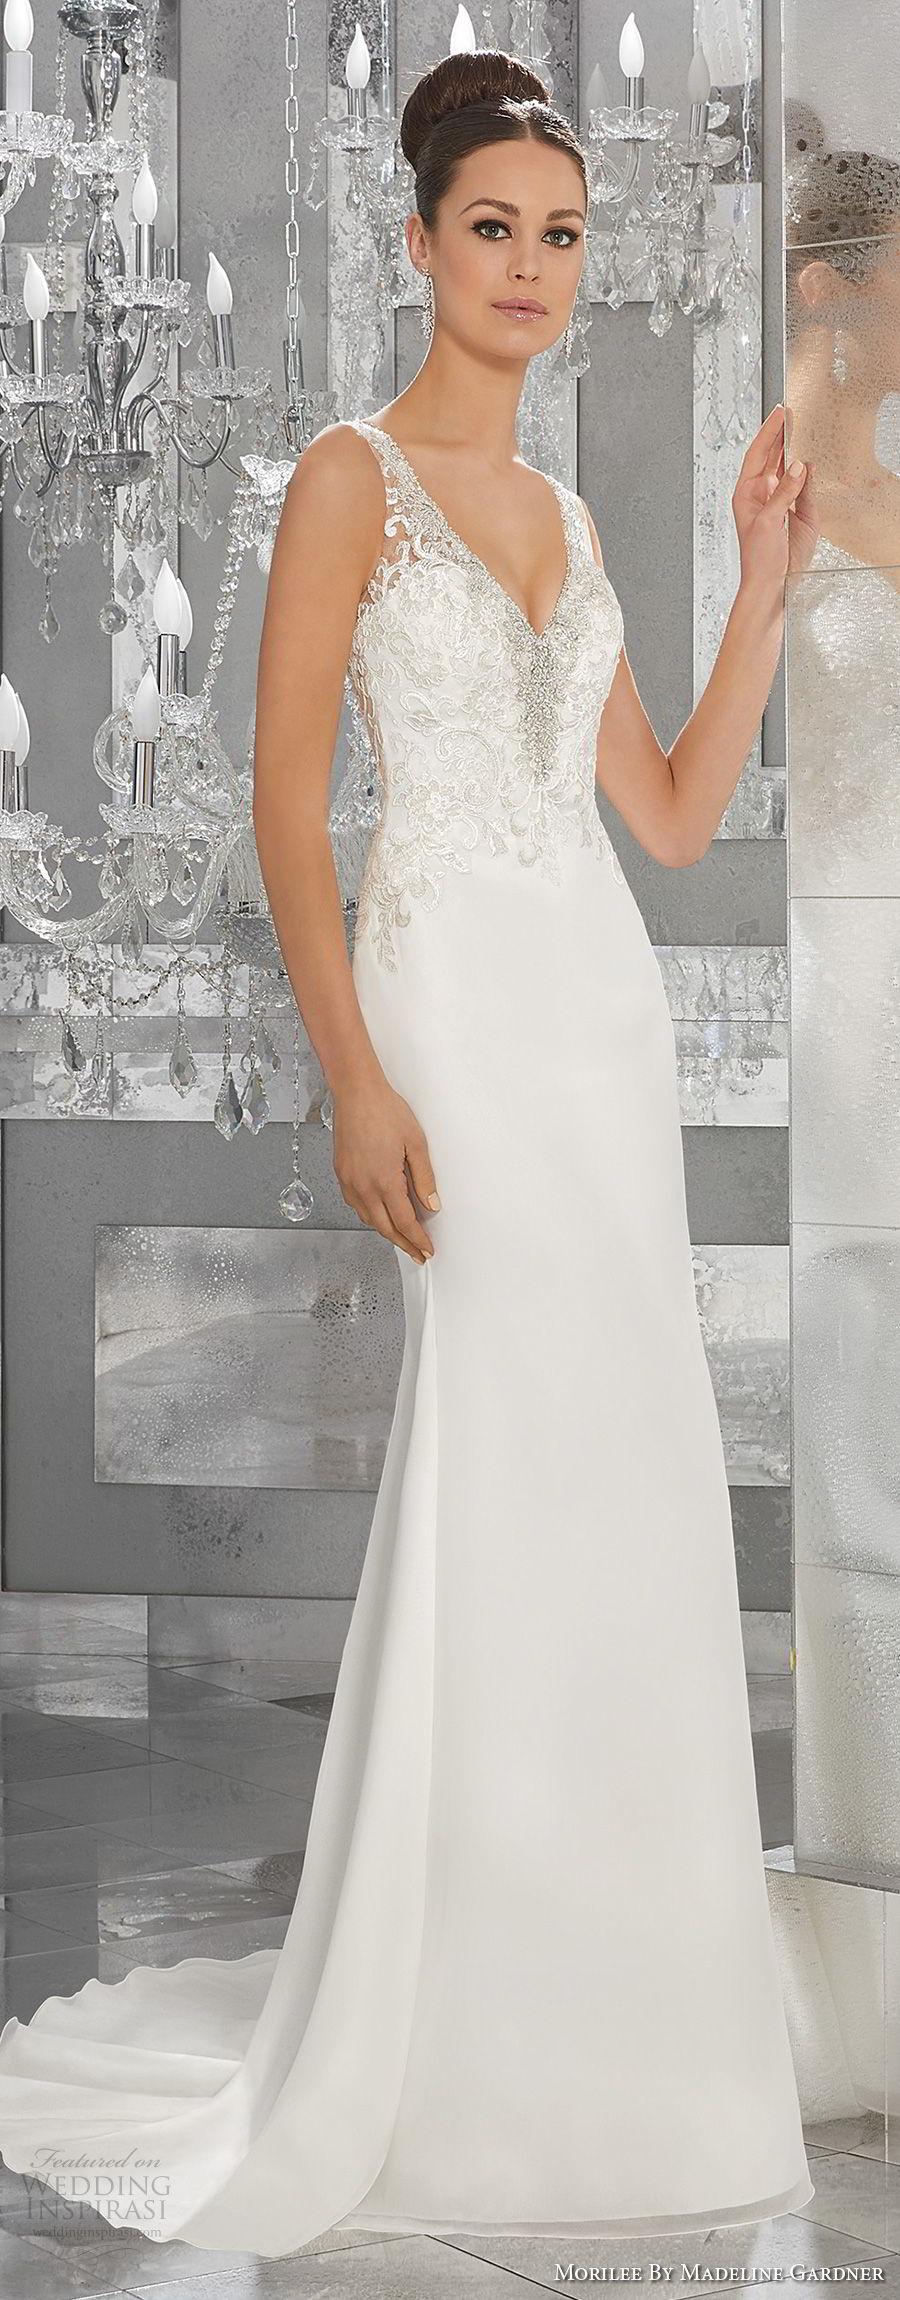 morilee fall 2017 blu bridal sleeveless strap v neck heavily embellished bodice elegant sheath wedding dress button lace back short train (64) mv